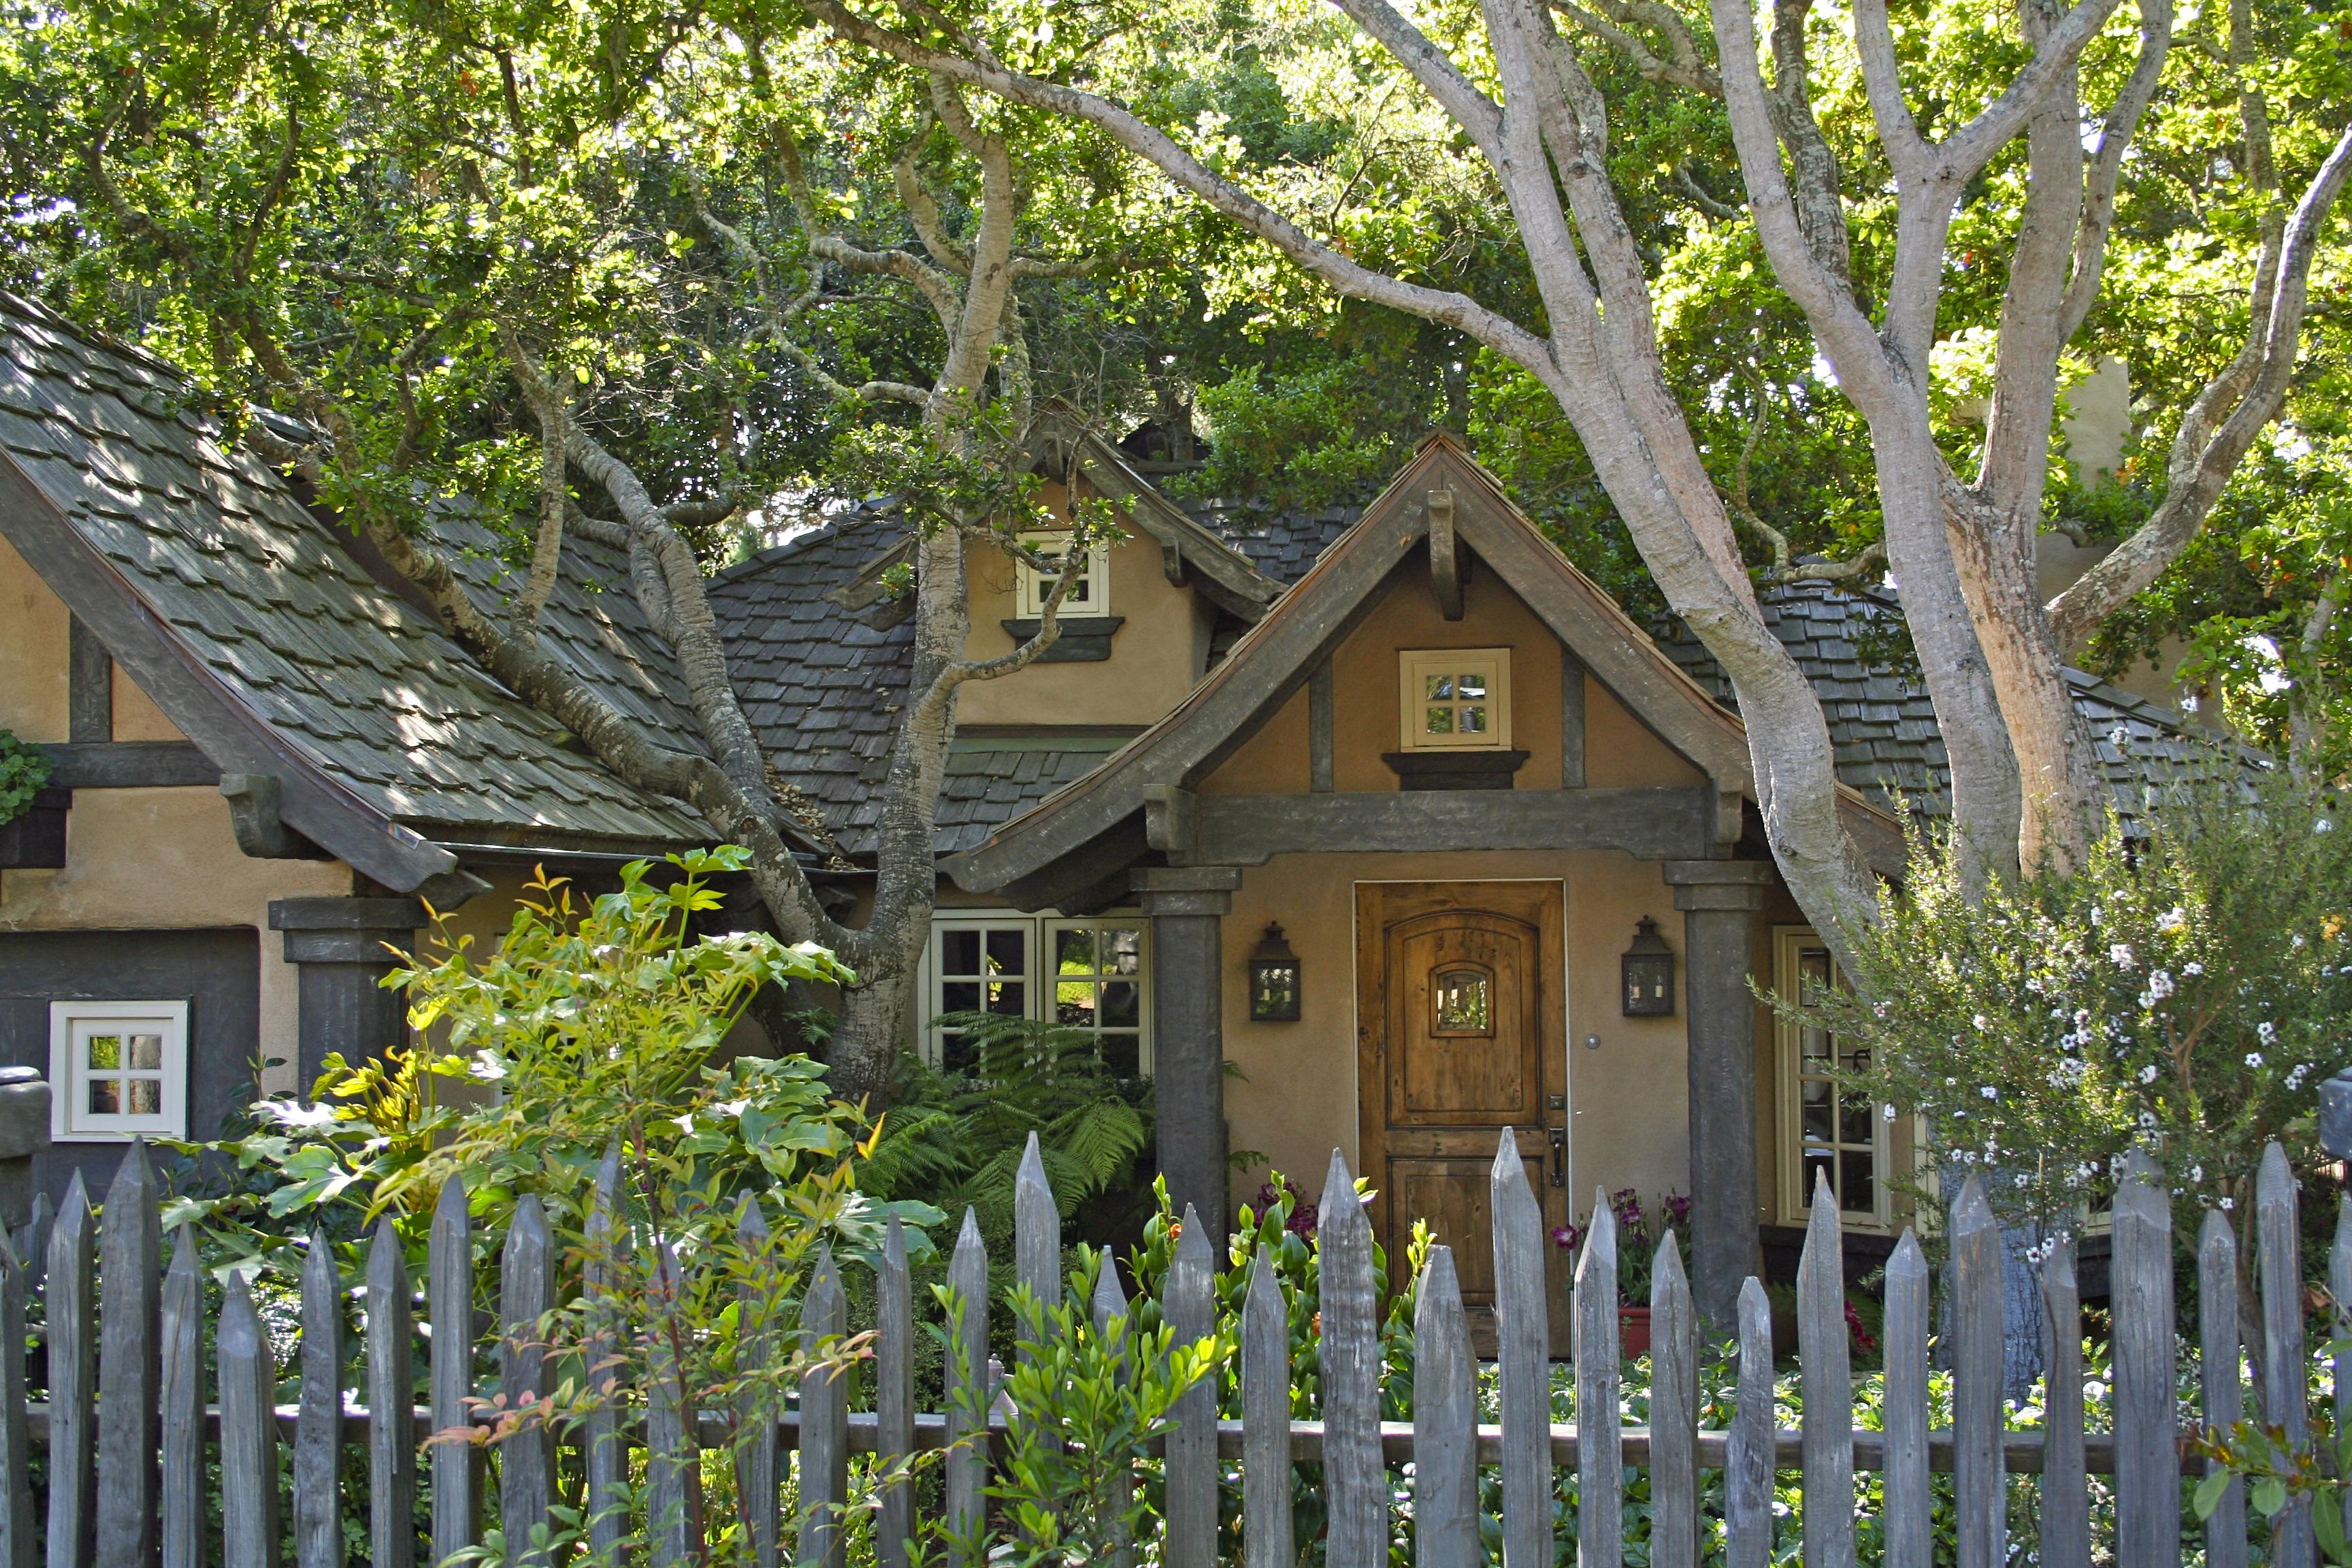 Ambleside Cottage Designed Square Inch Rather